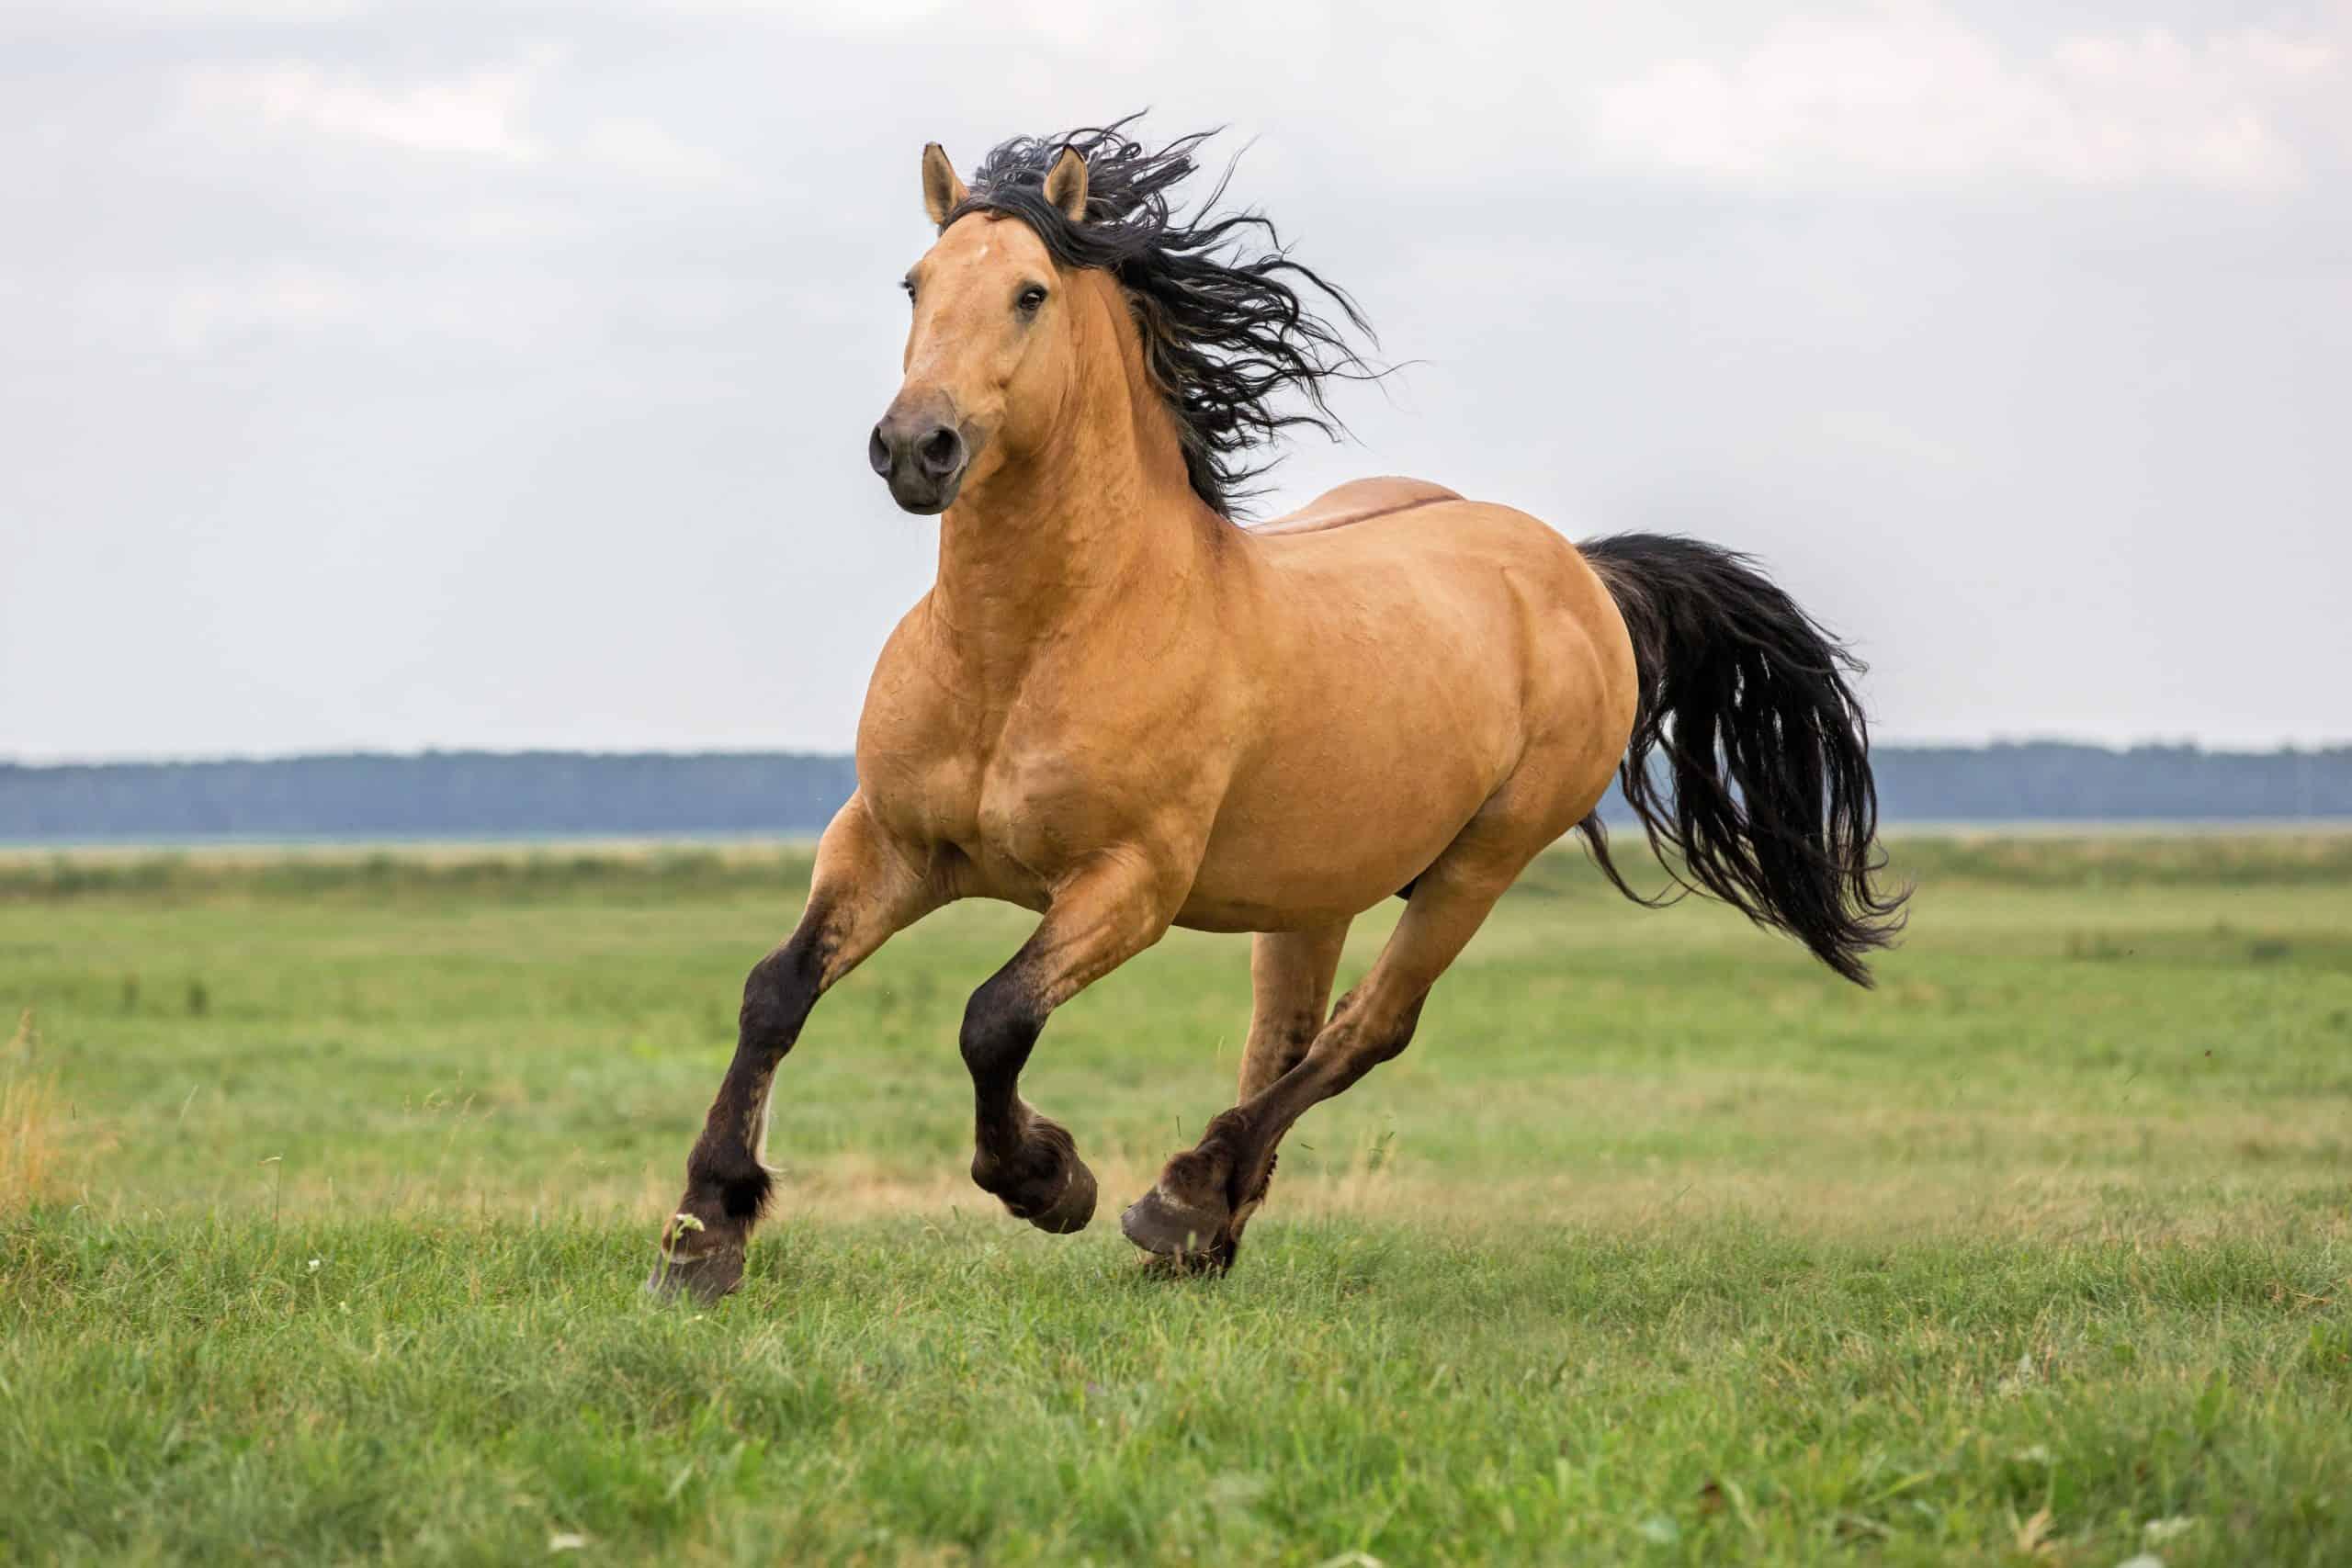 Horse running on a summer meadow.